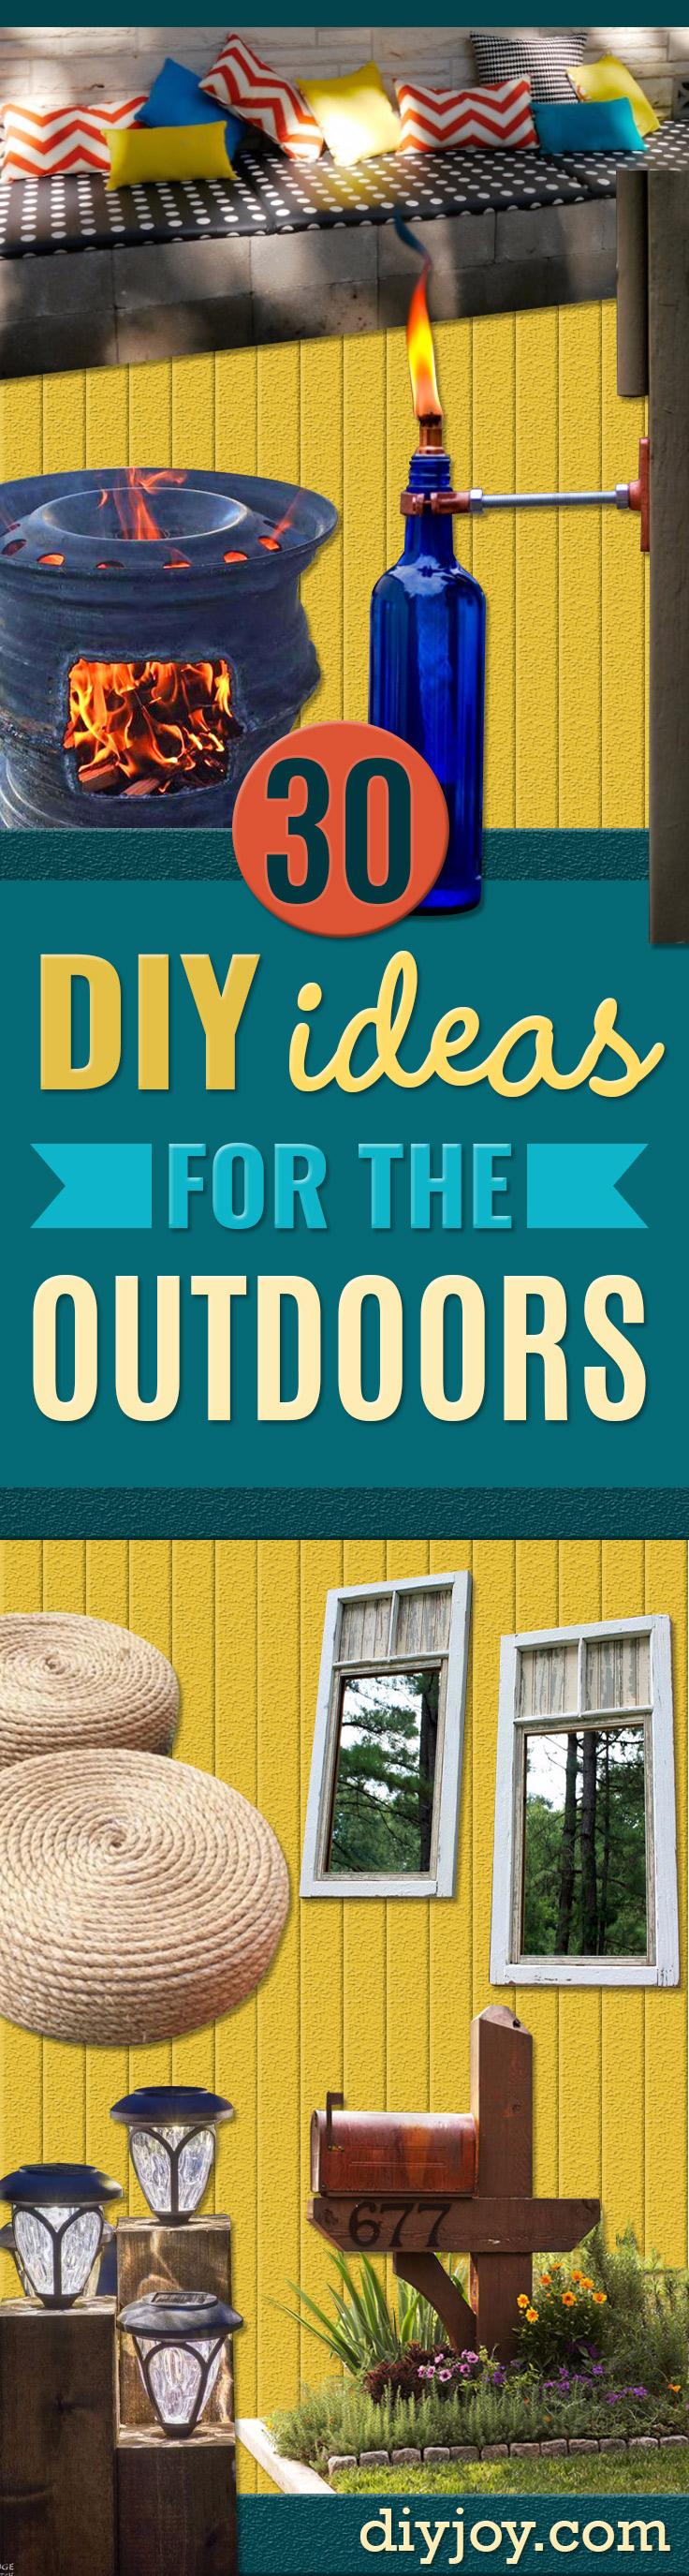 30 Creative DIY Ideas for The Outdoors